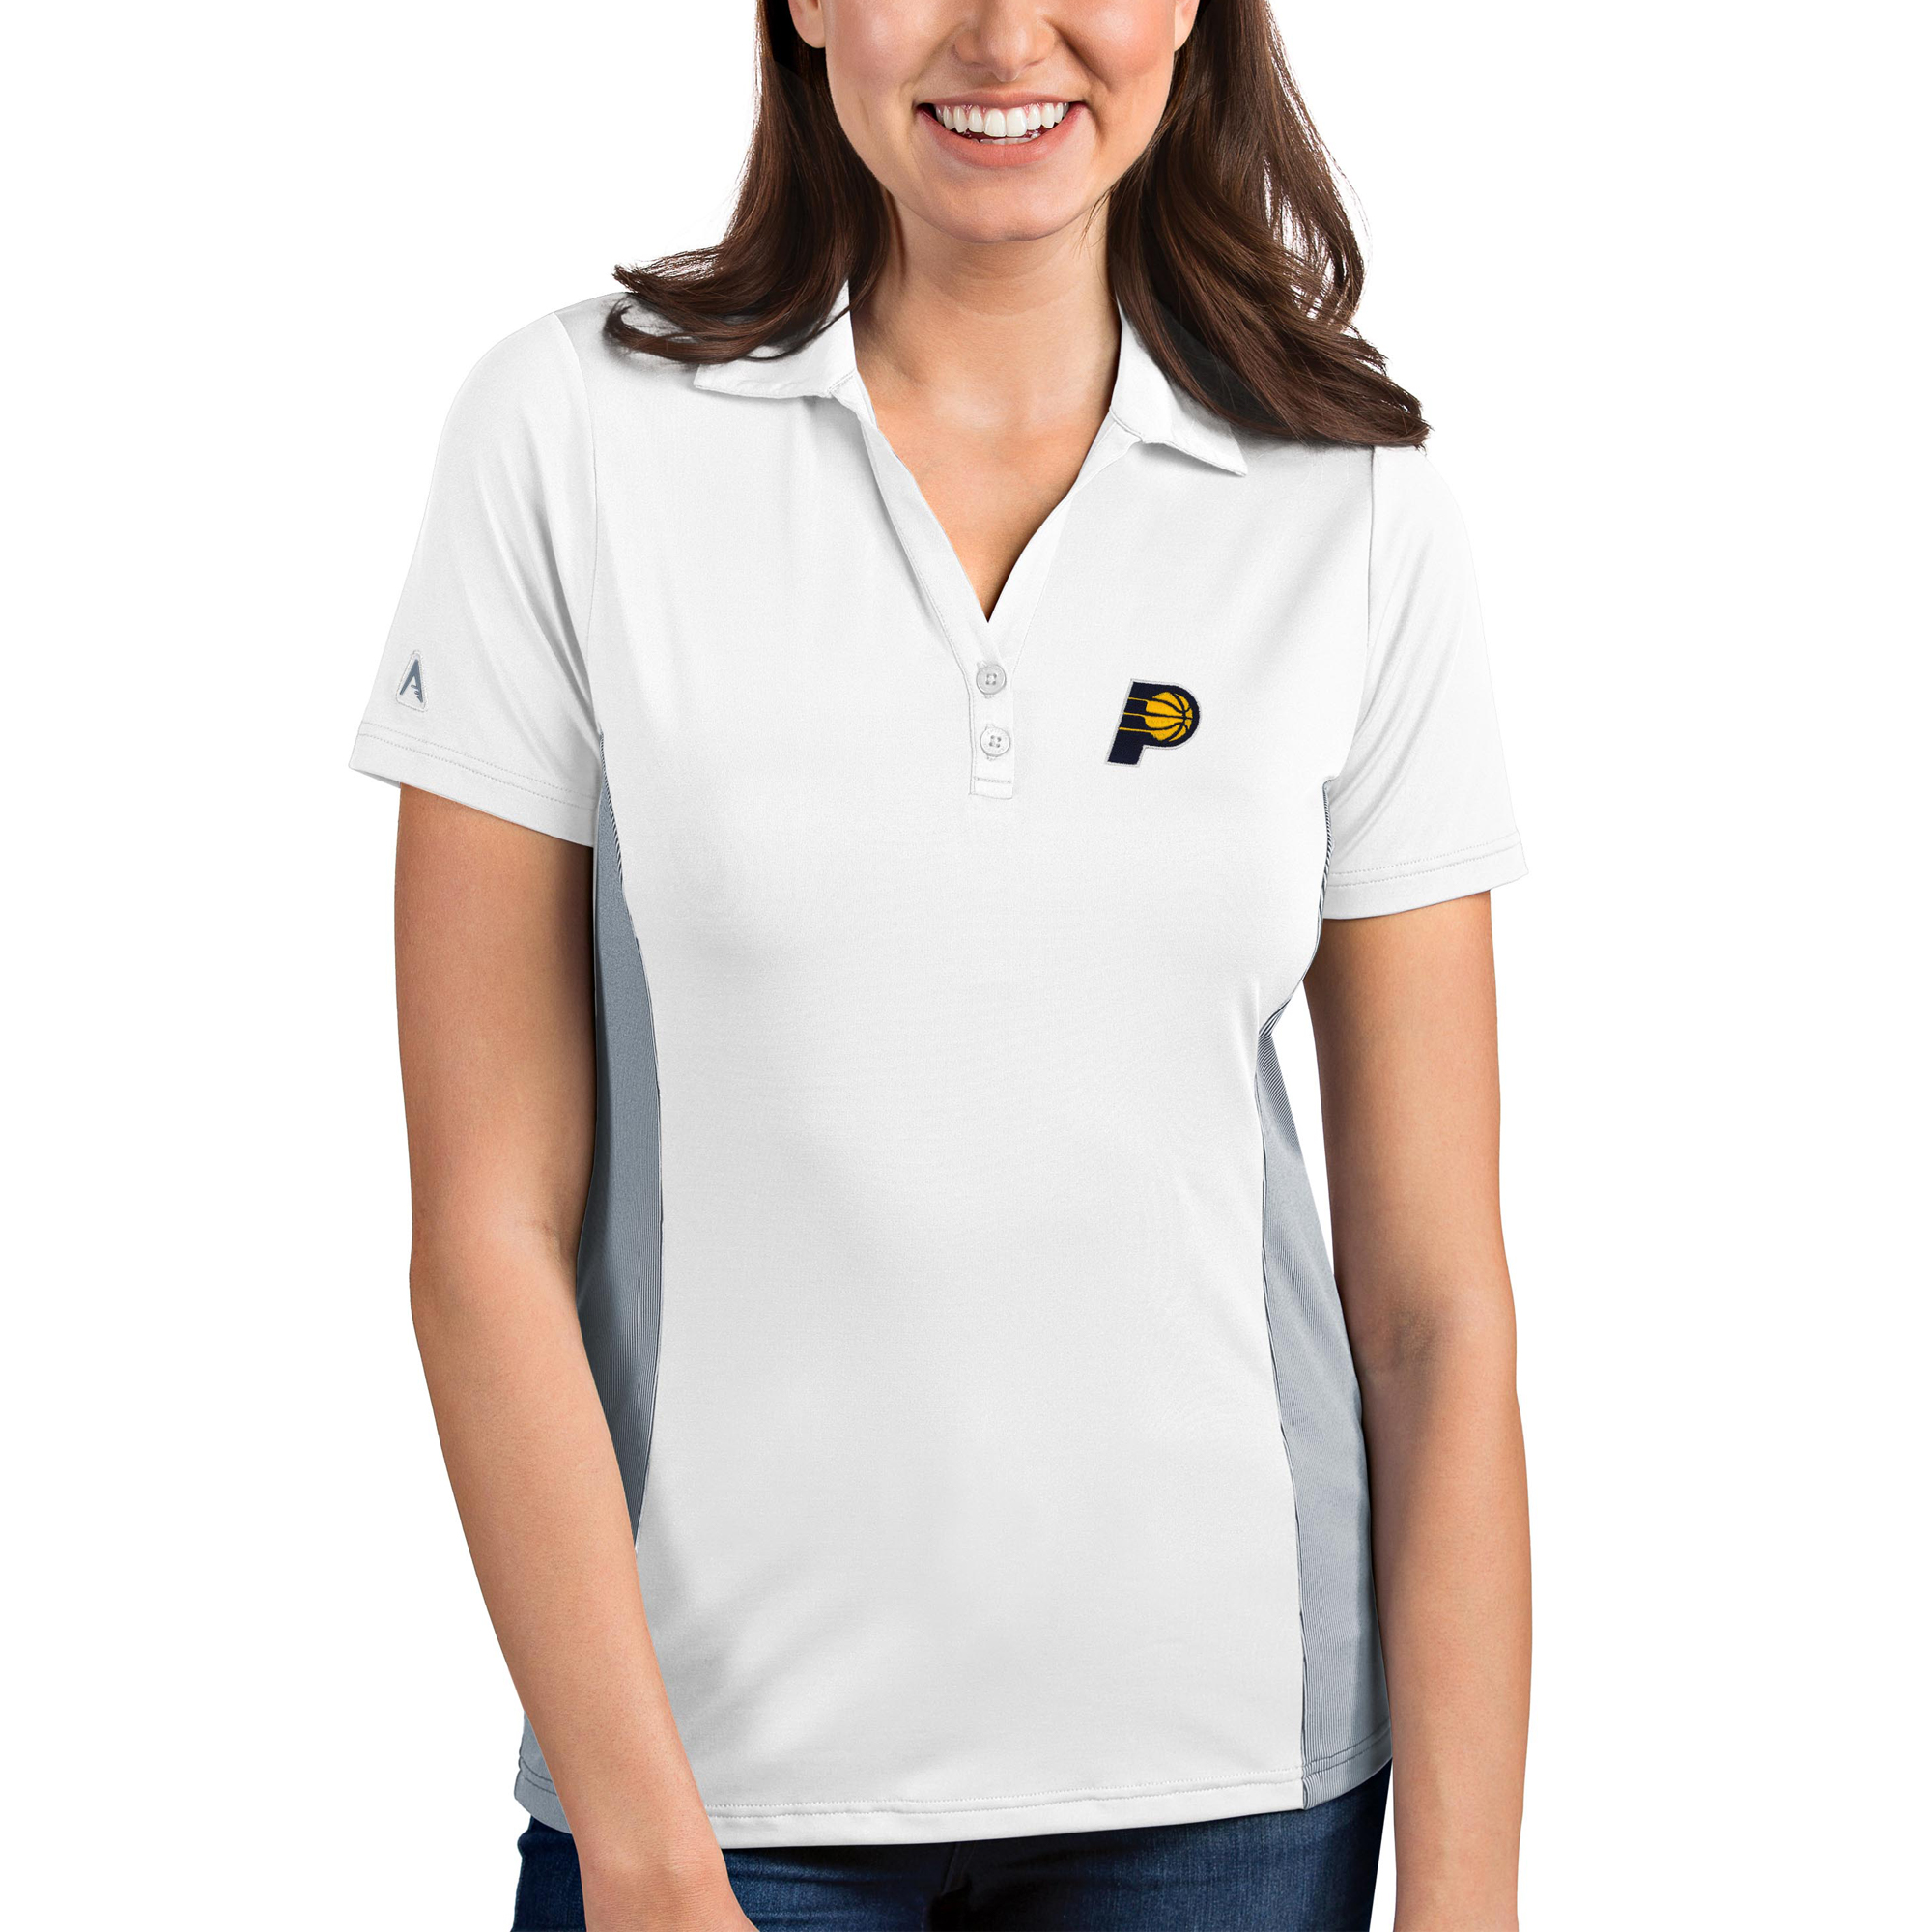 Indiana Pacers Antigua Women's Venture Polo - White/Gray